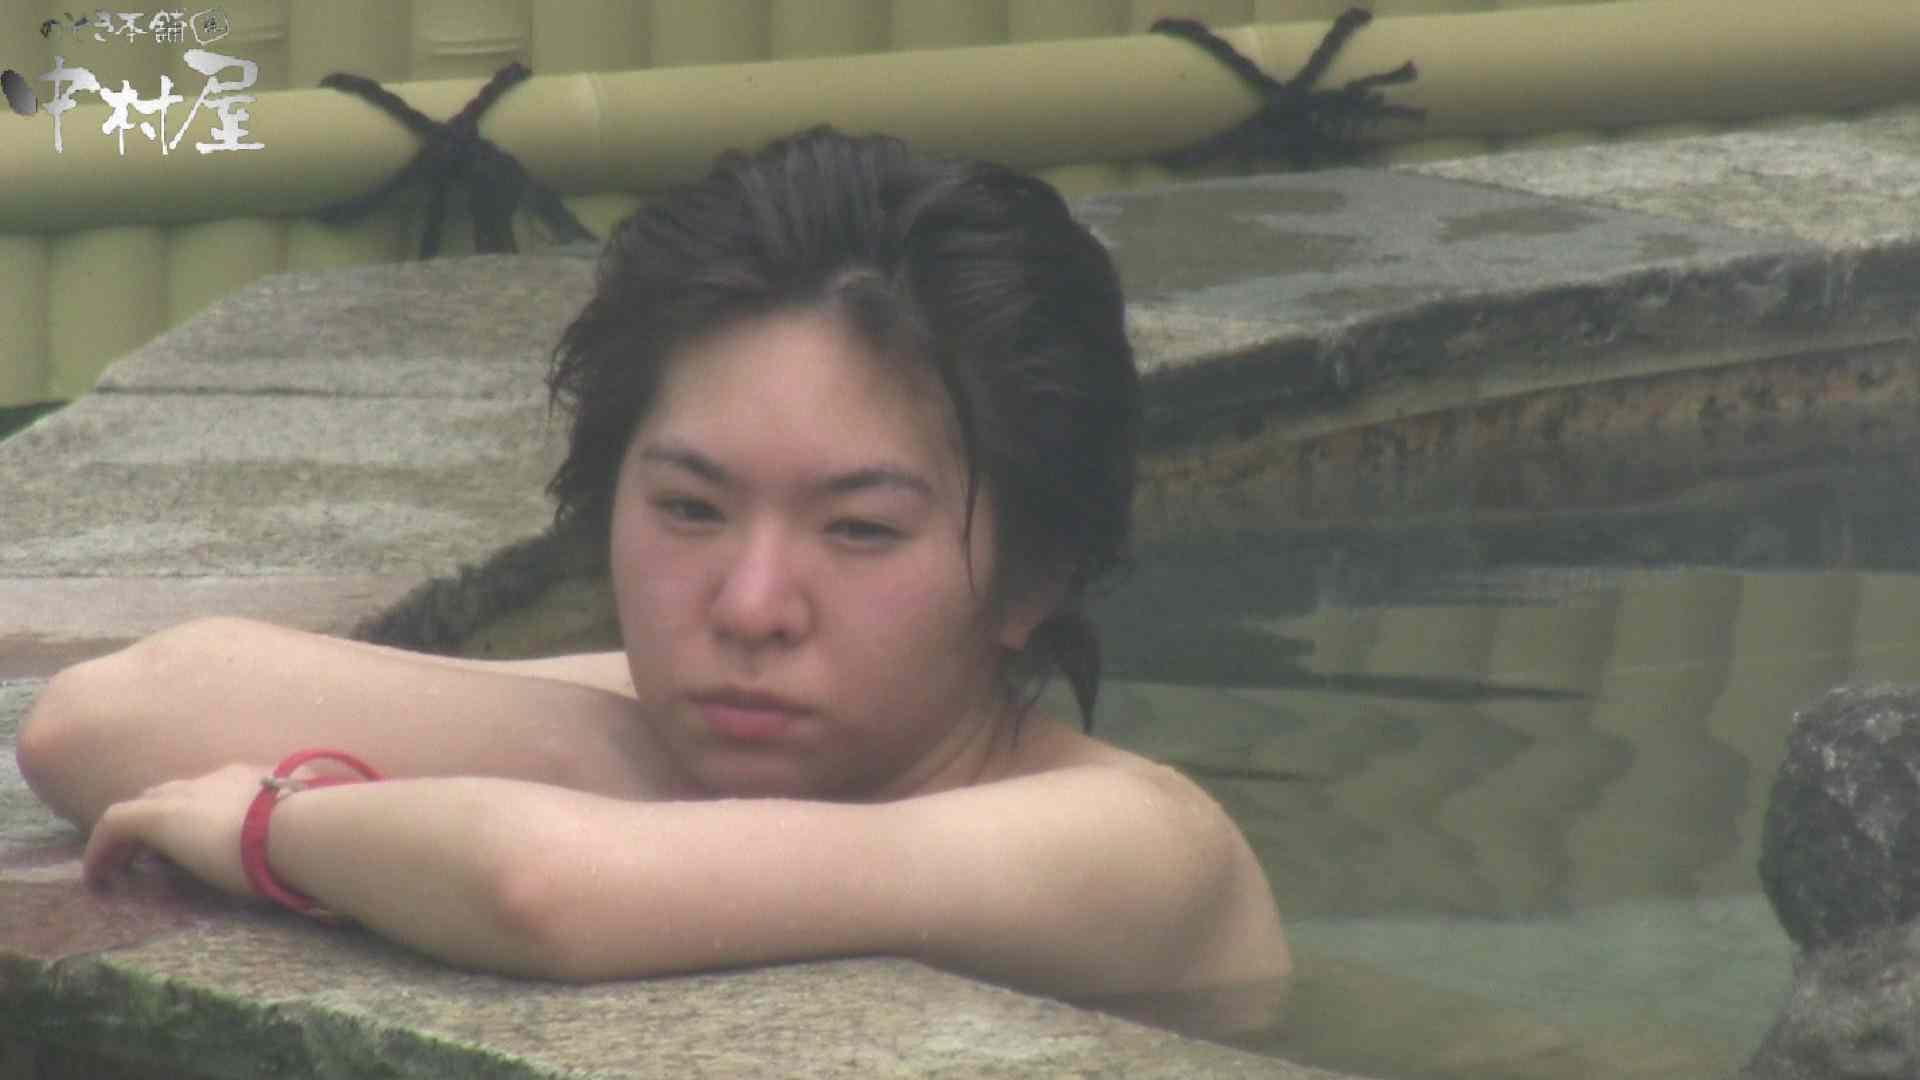 Aquaな露天風呂Vol.907 盗撮師作品  70pic 66